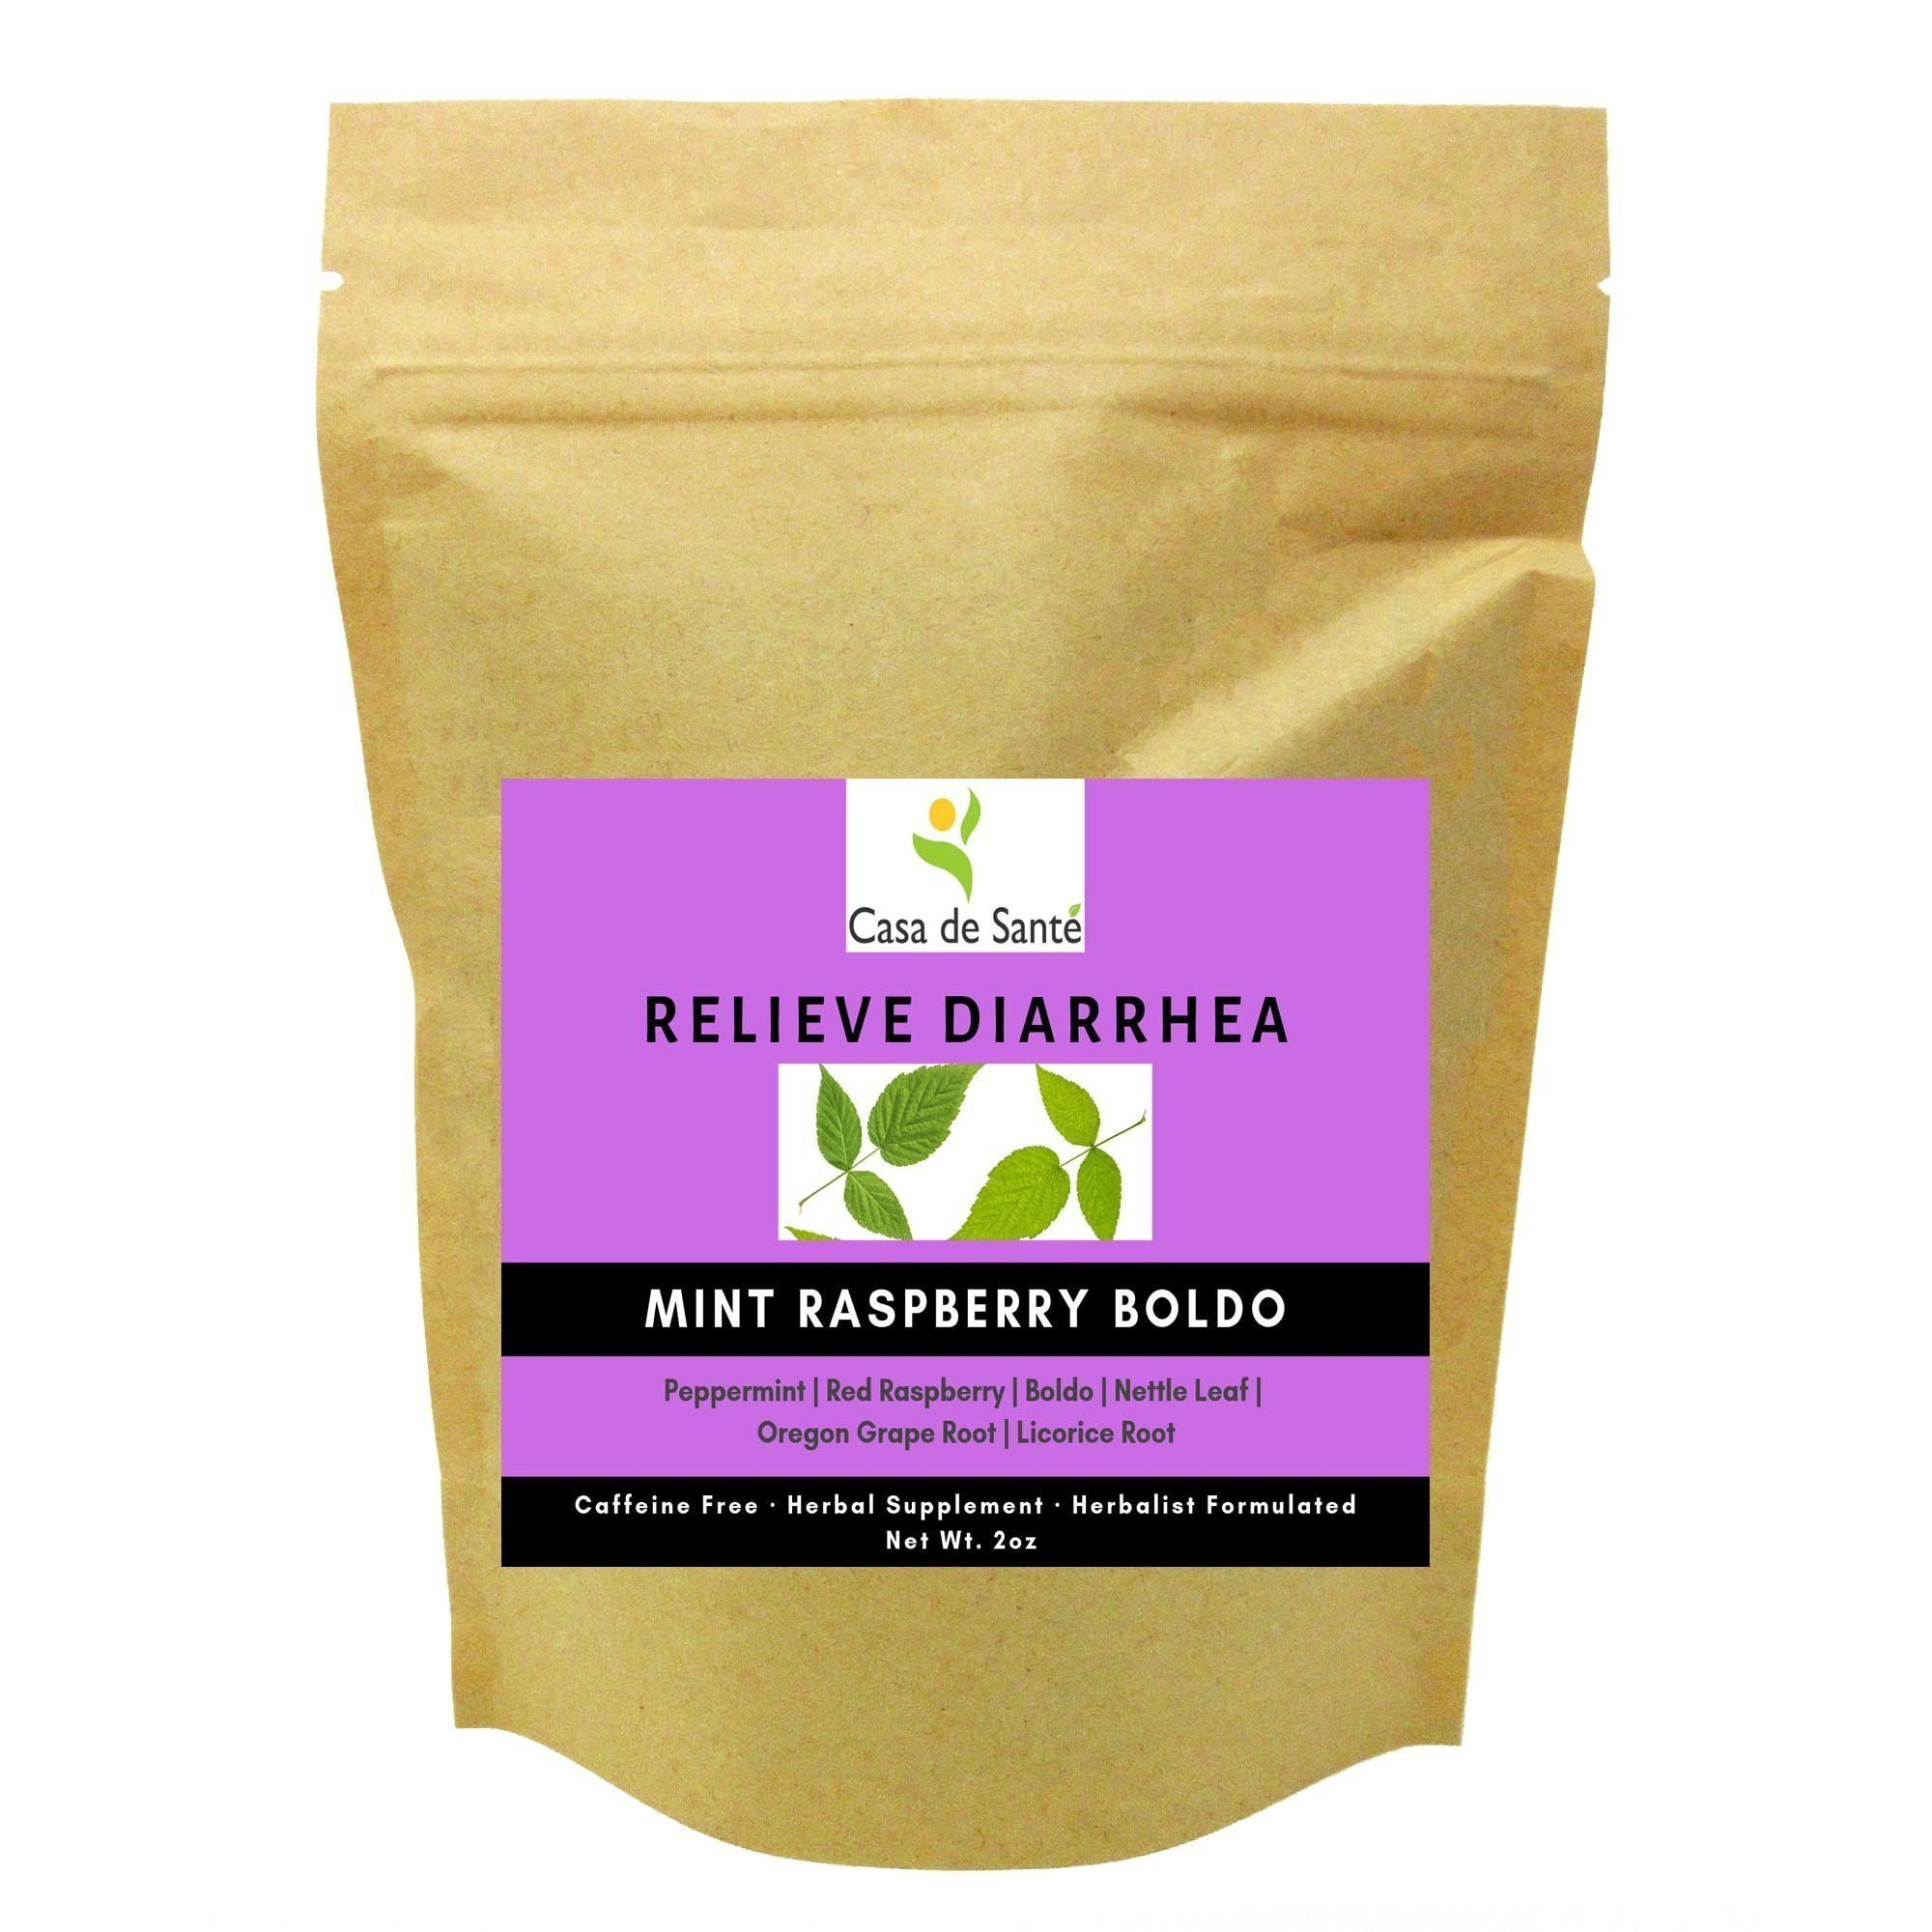 Mint Raspberry Boldo Herbal Tea - Digestive Tea for Diarrhea